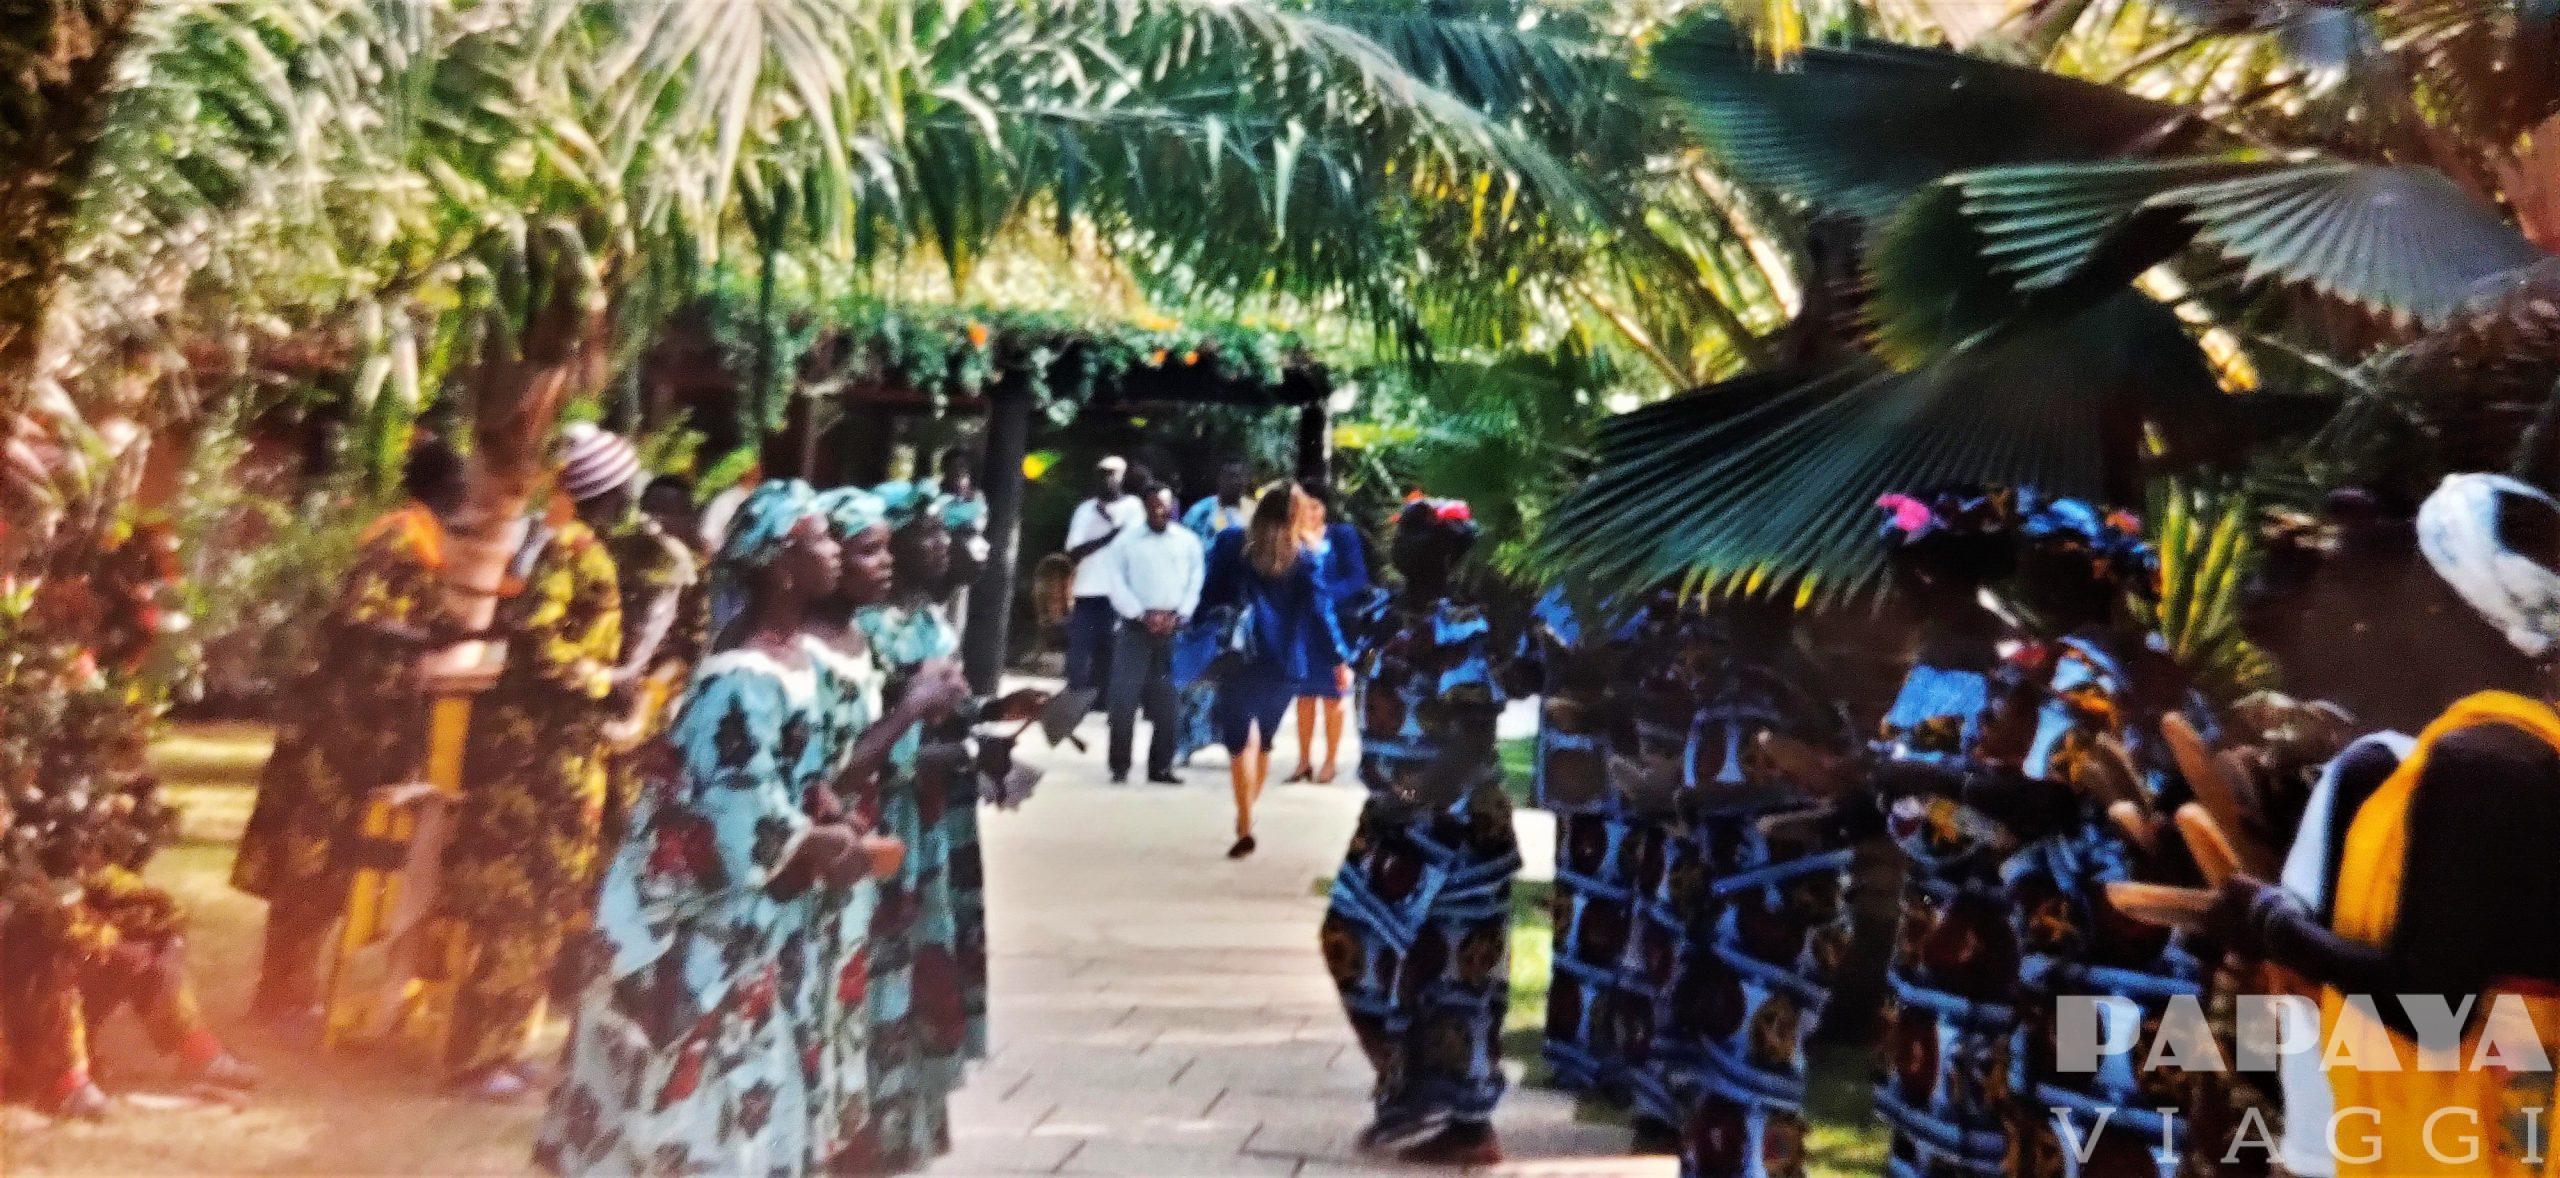 Dal Lago Rosa alla Casamance